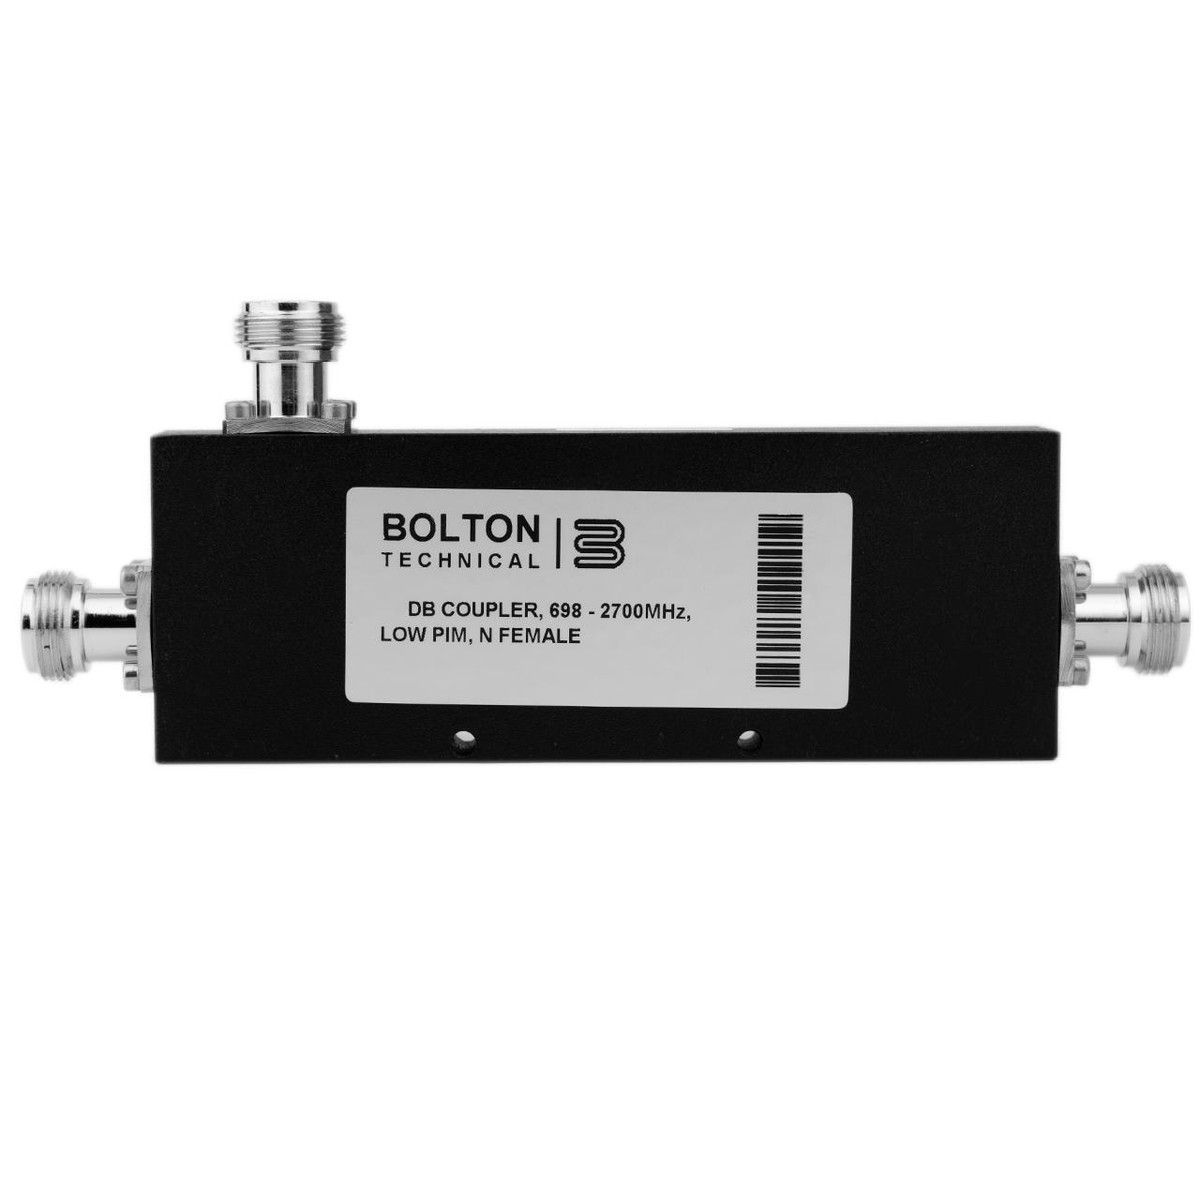 Bolton Tech Bolton Technical 6 dB Coupler, 698-2700 MHz, Low-PIM, N-Female